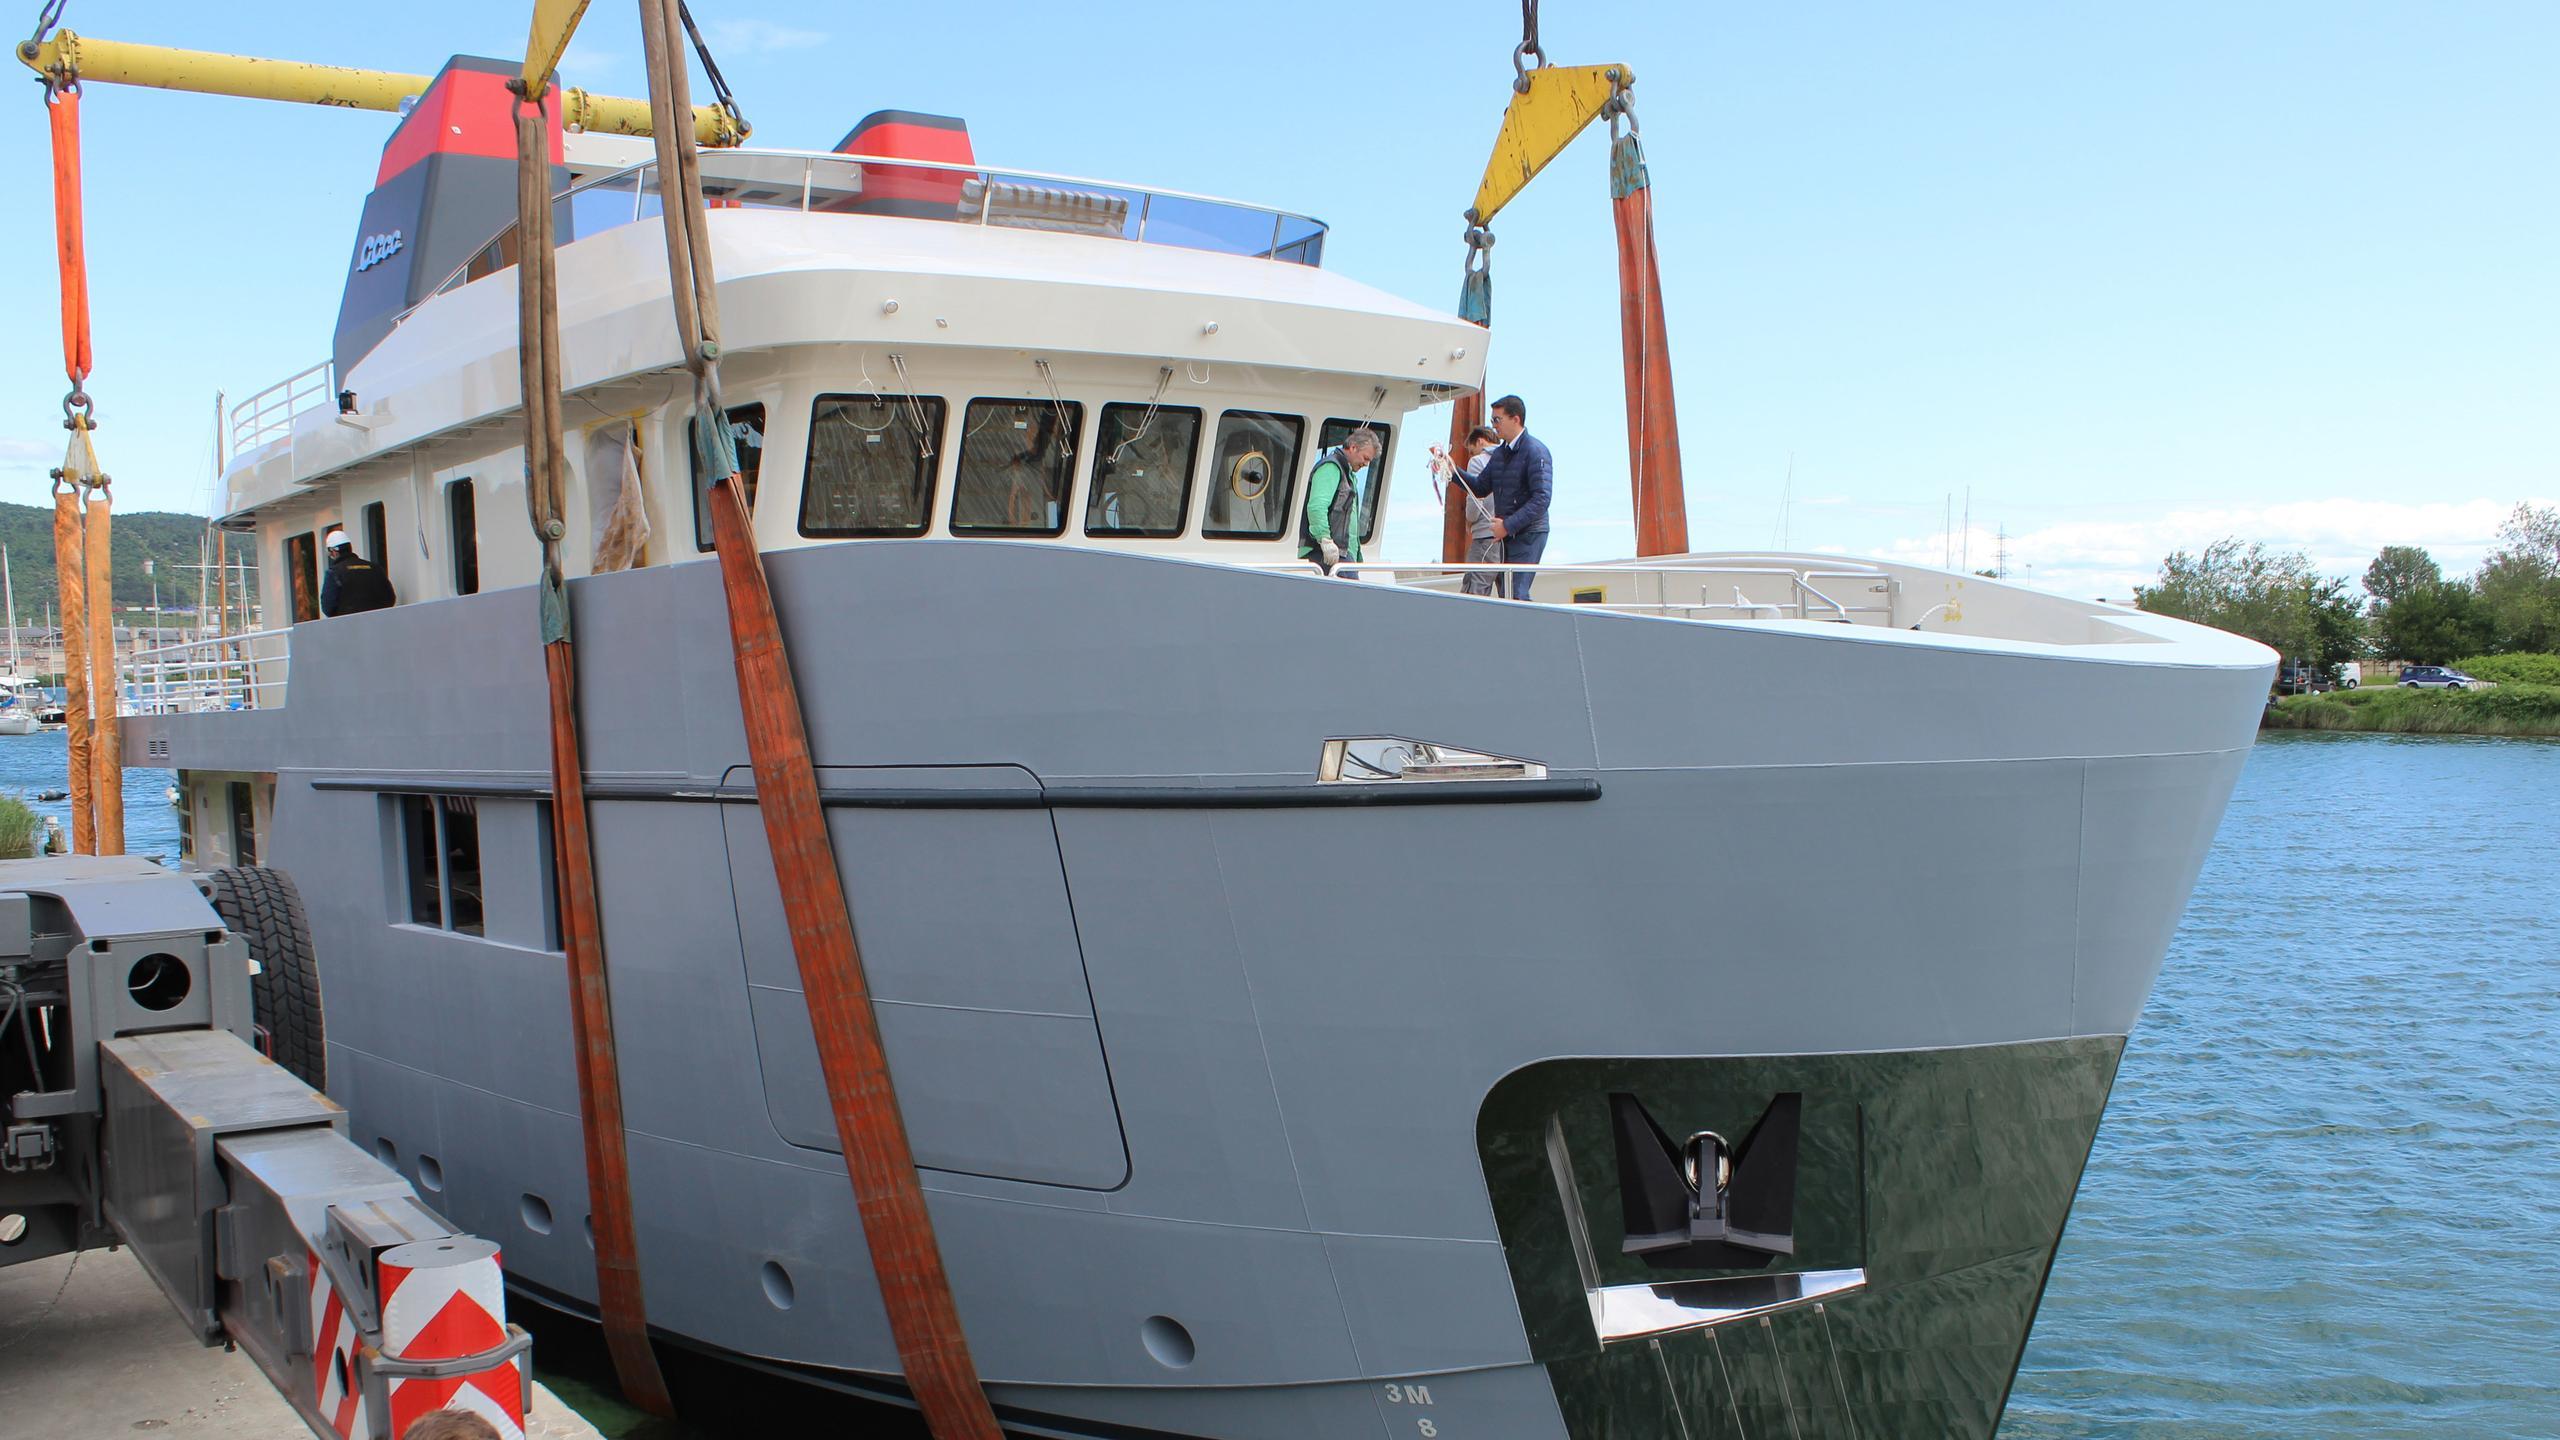 CAROLIN-IV-motor-yacht-mmgi-omega-forte-100-101m-2016-bow